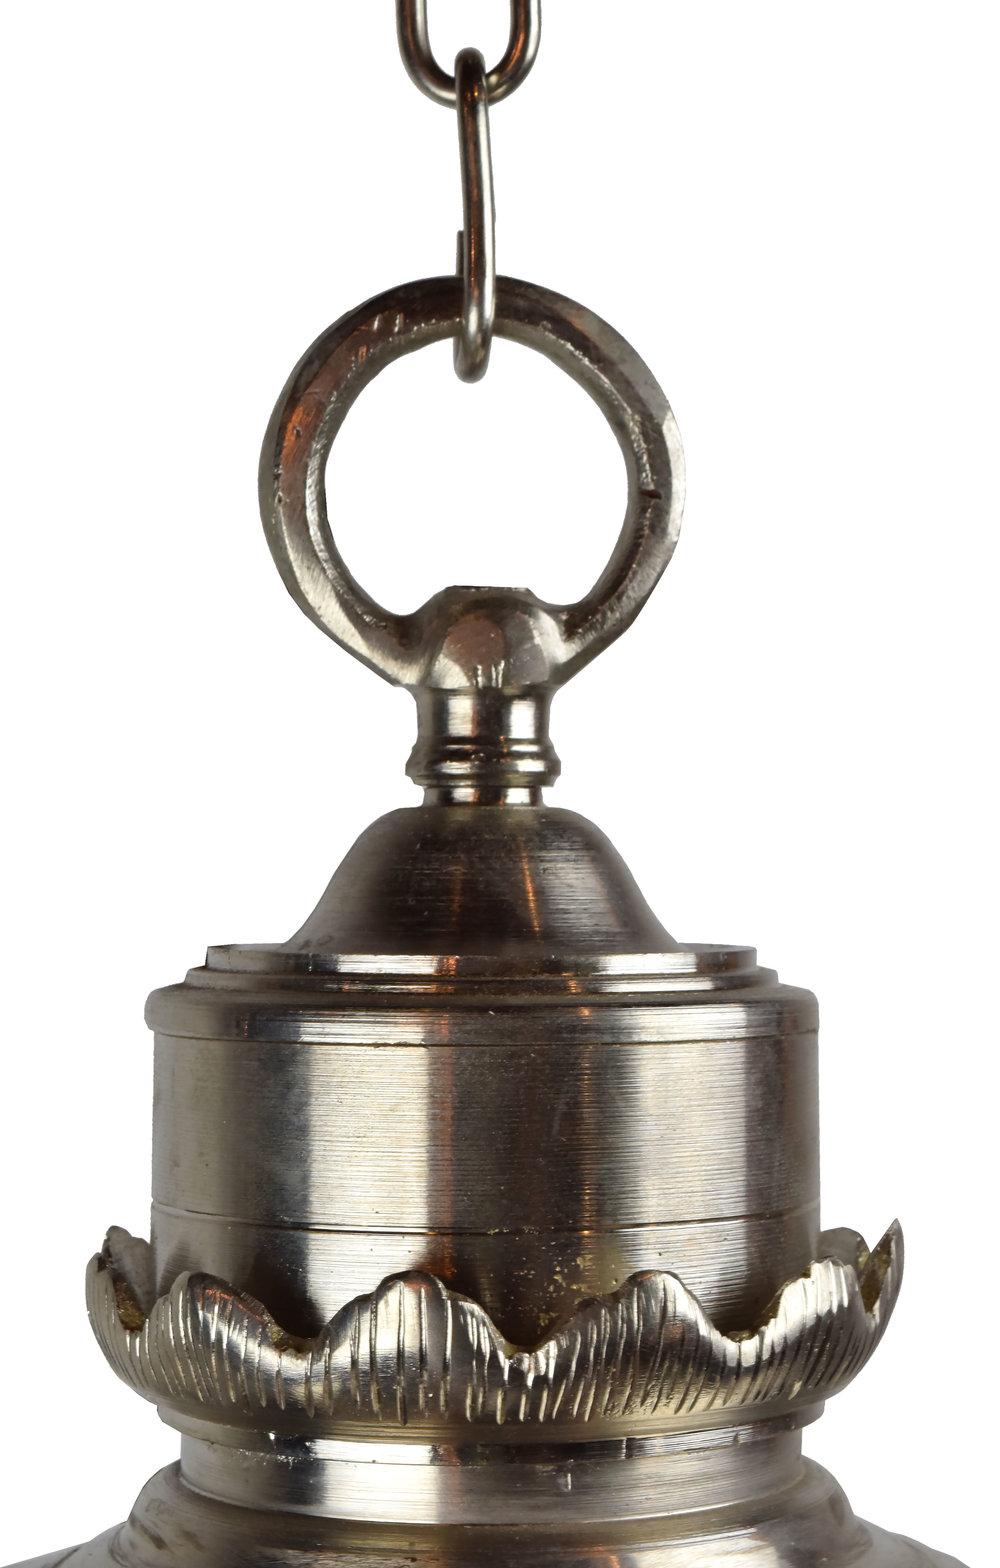 47168-small-spherical-nickel-pendant-chain-detail.jpg